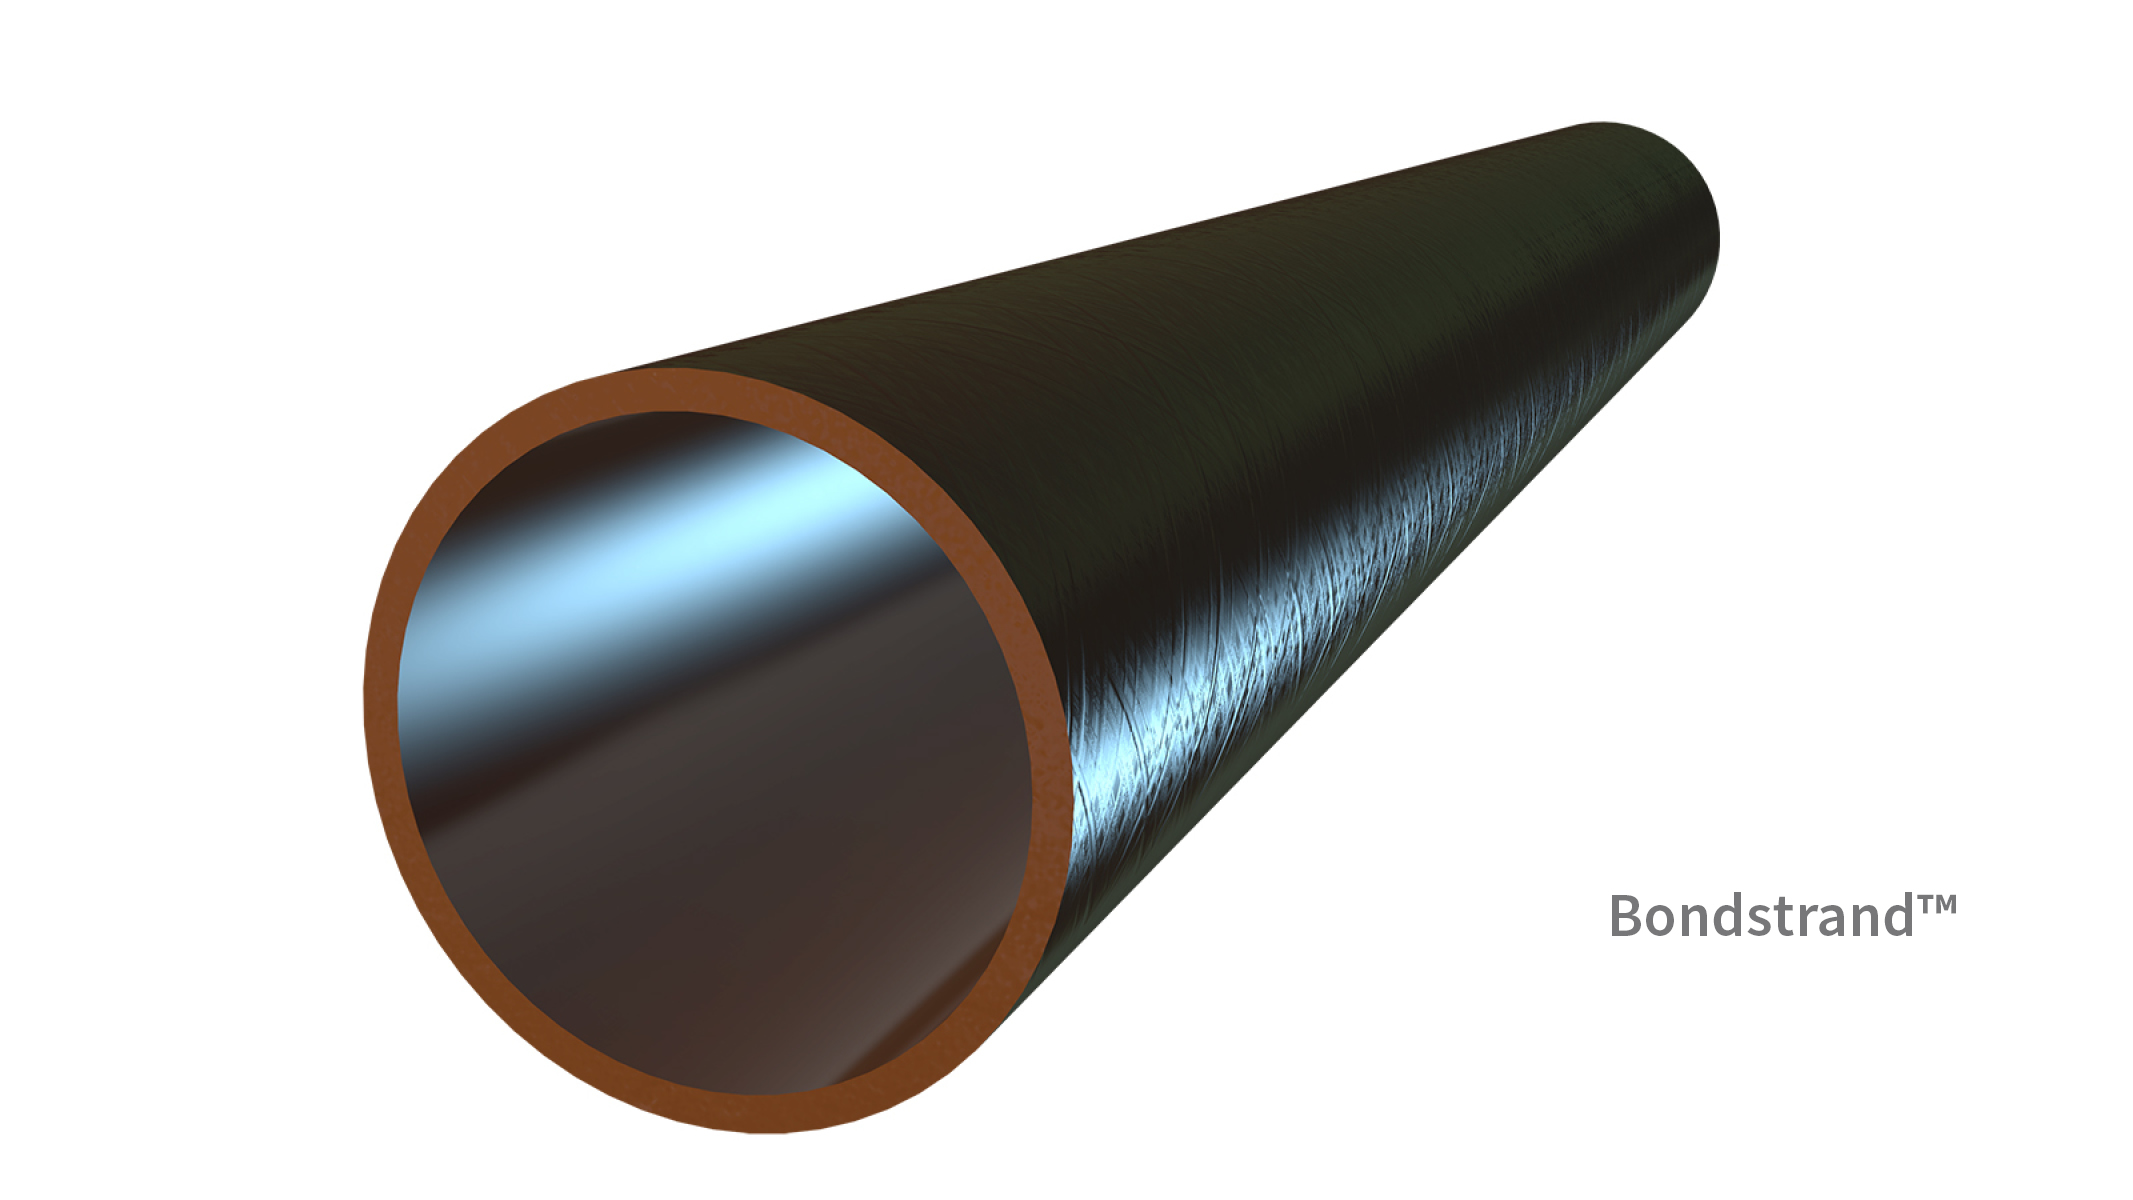 NOV GLASS REINFORCED EPOXY BONDSTRAND PIPES